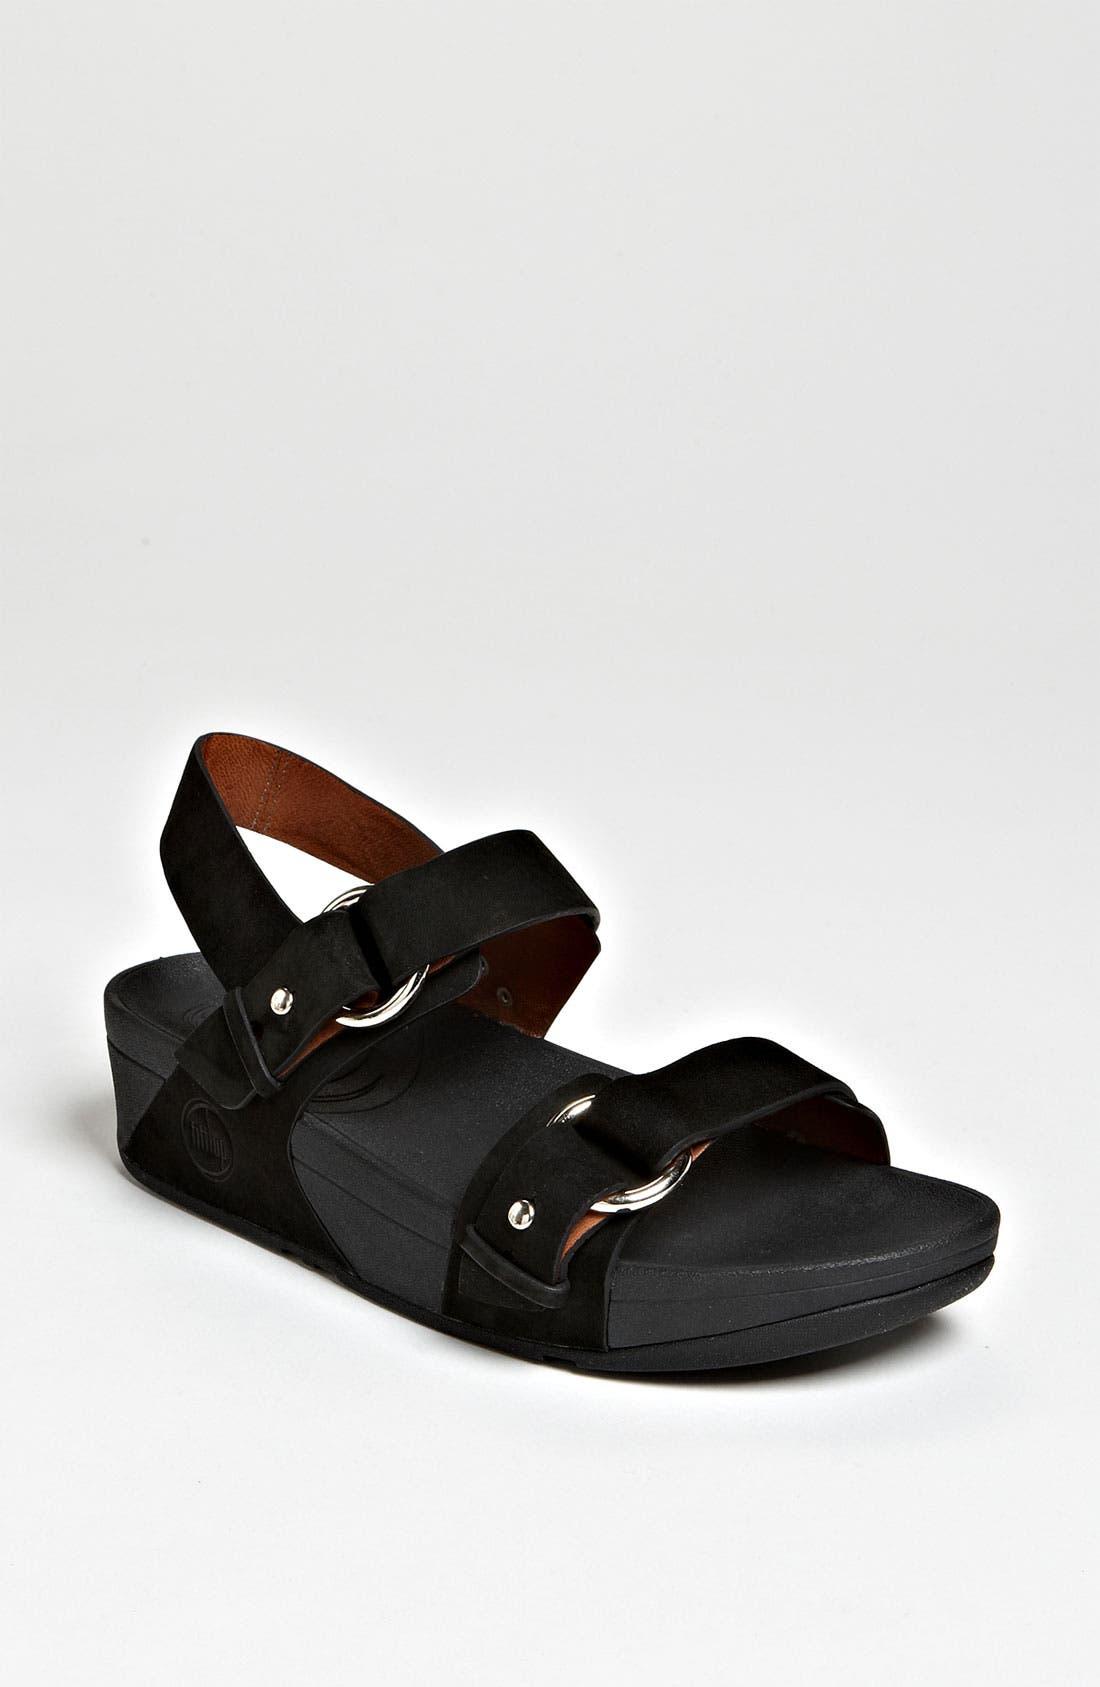 Alternate Image 1 Selected - FitFlop 'Via™ Bar' Sandal